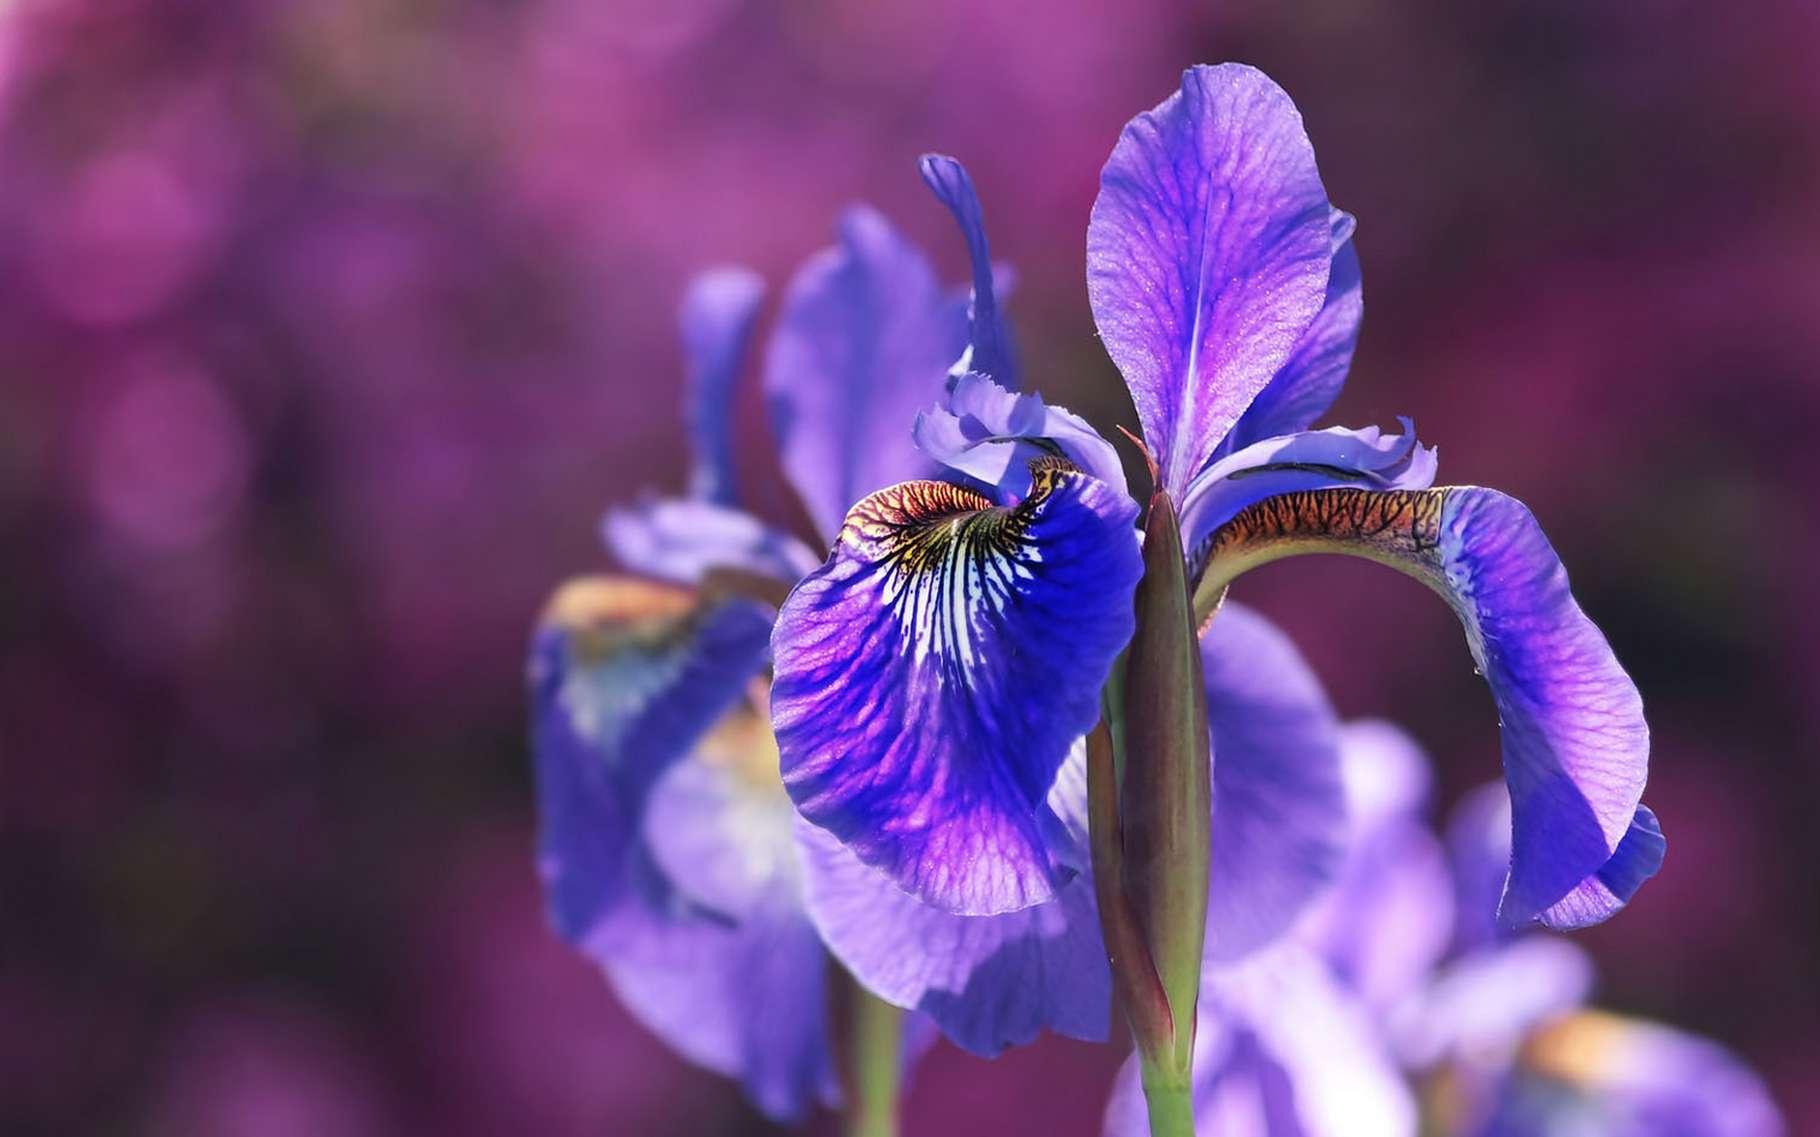 L'iris violet est très odorant. © Pixel2013, Pixabay, DP